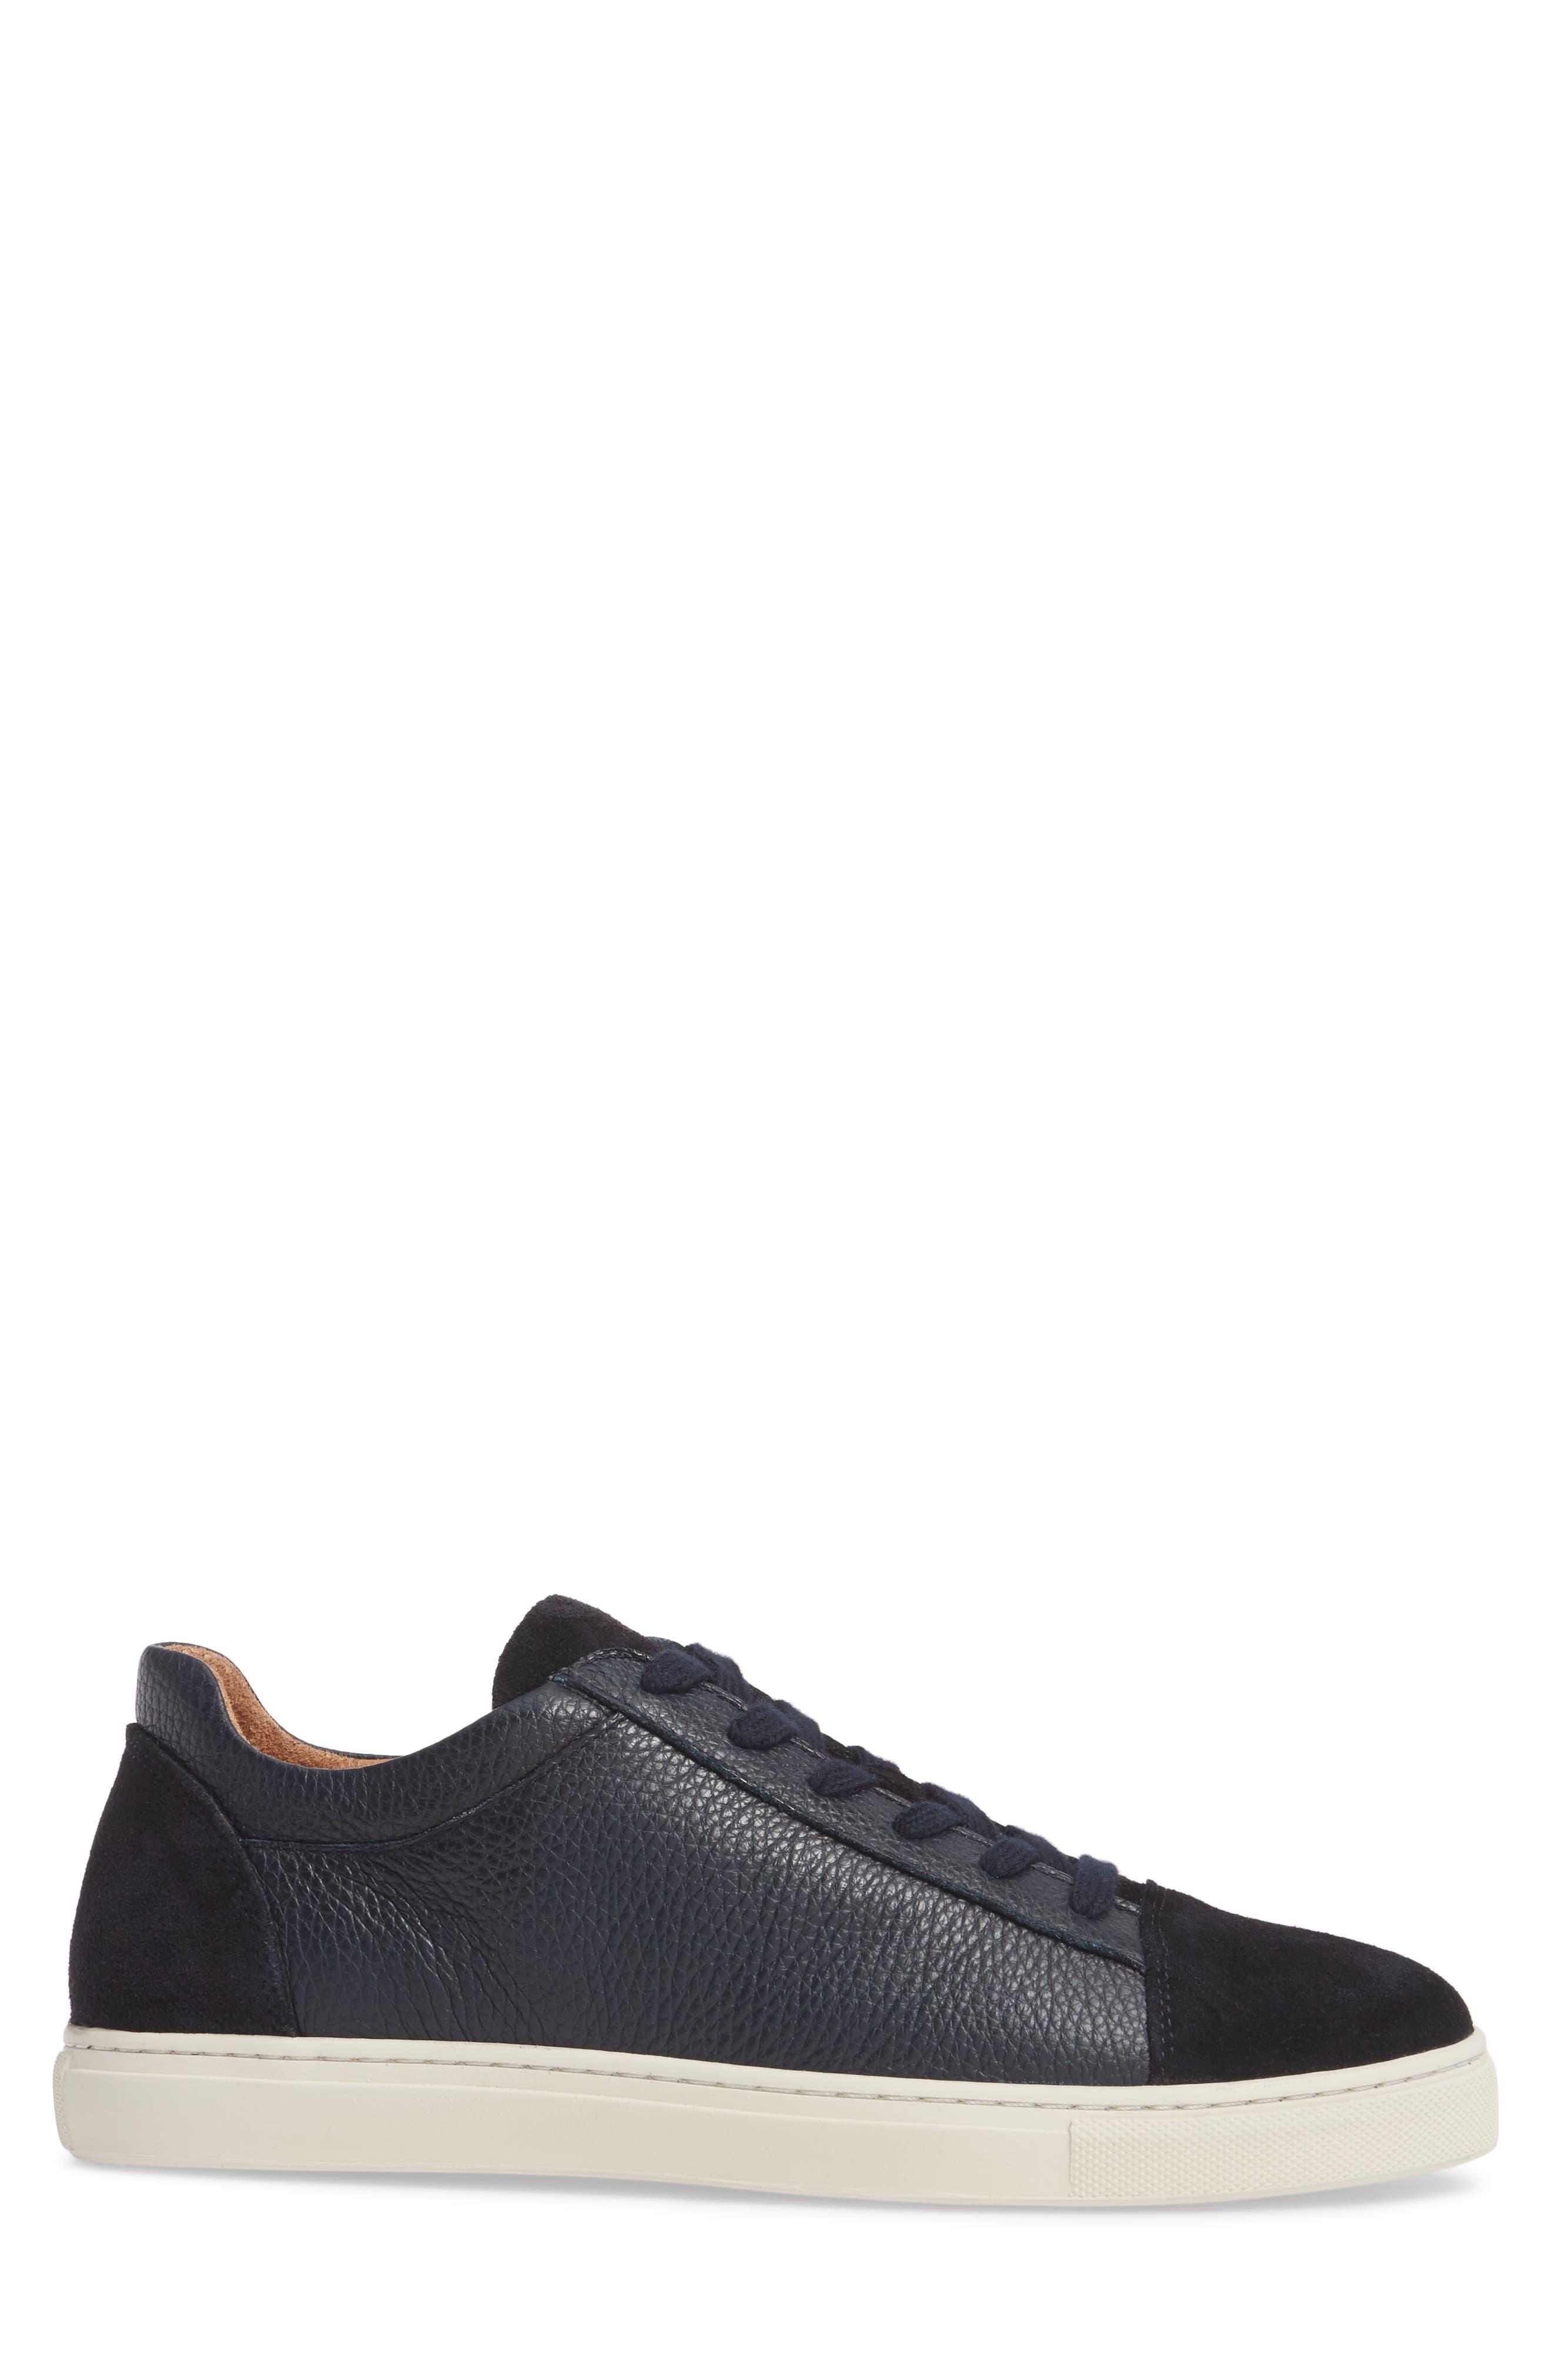 David Cap Toe Sneaker,                             Alternate thumbnail 3, color,                             Dark Navy Leather/ Suede